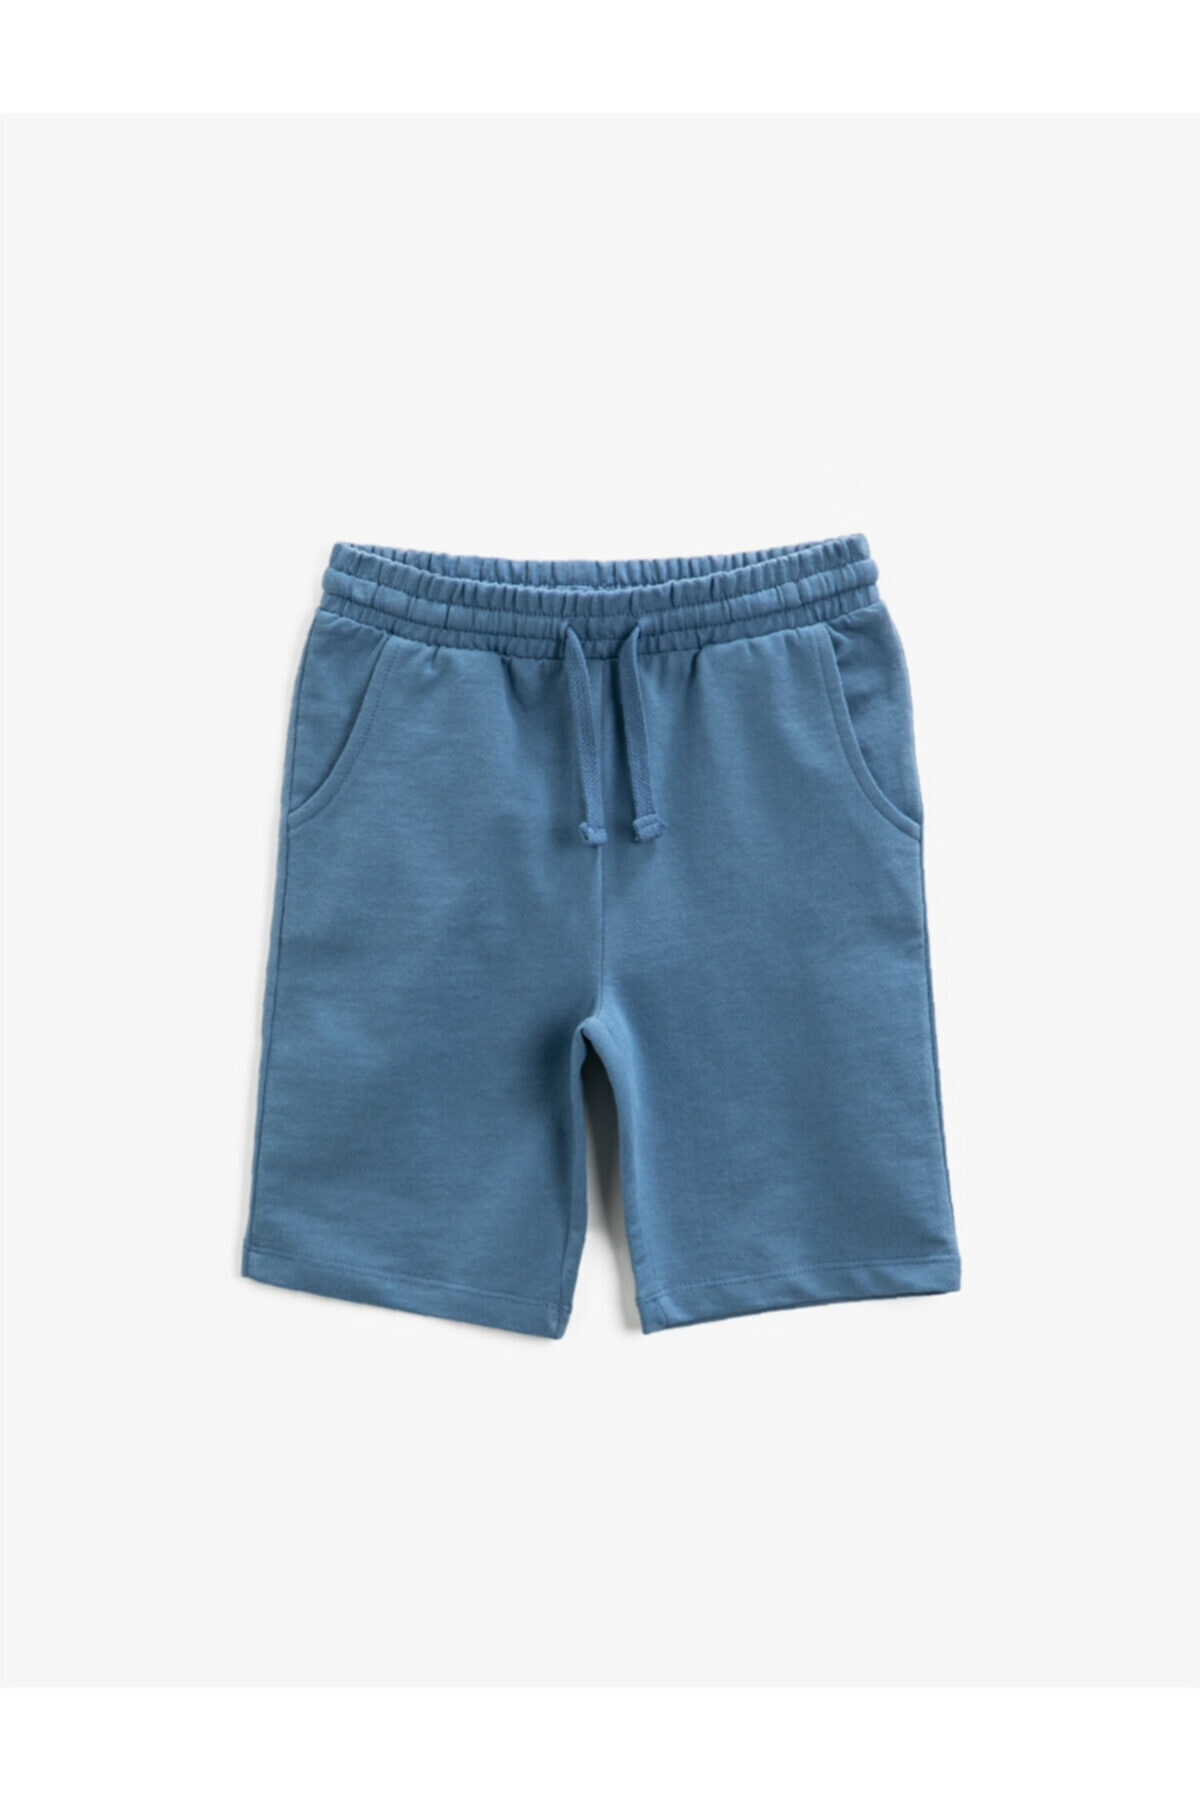 فروشگاه شلوارک بچه گانه برند کوتون رنگ آبی کد ty93617748